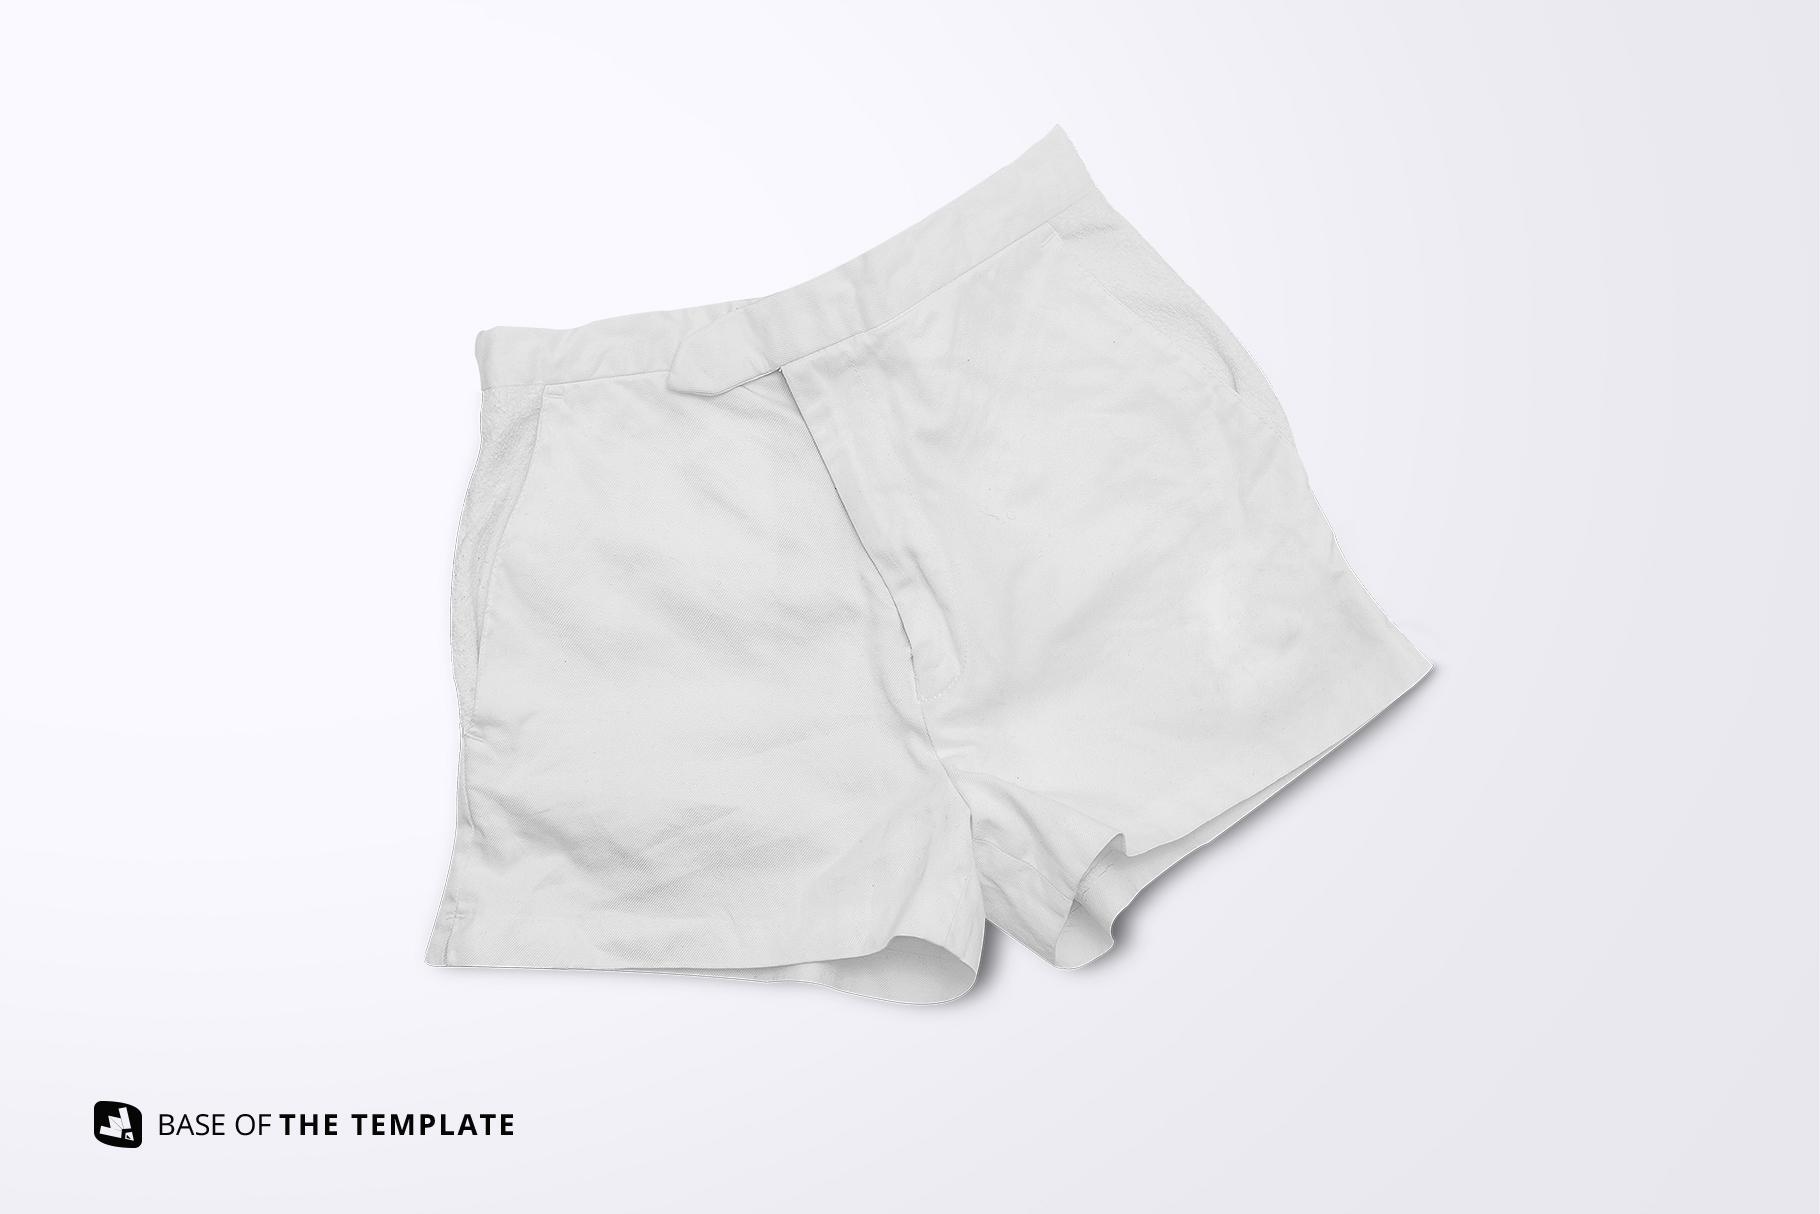 base image of the female cotton hot pants mockup